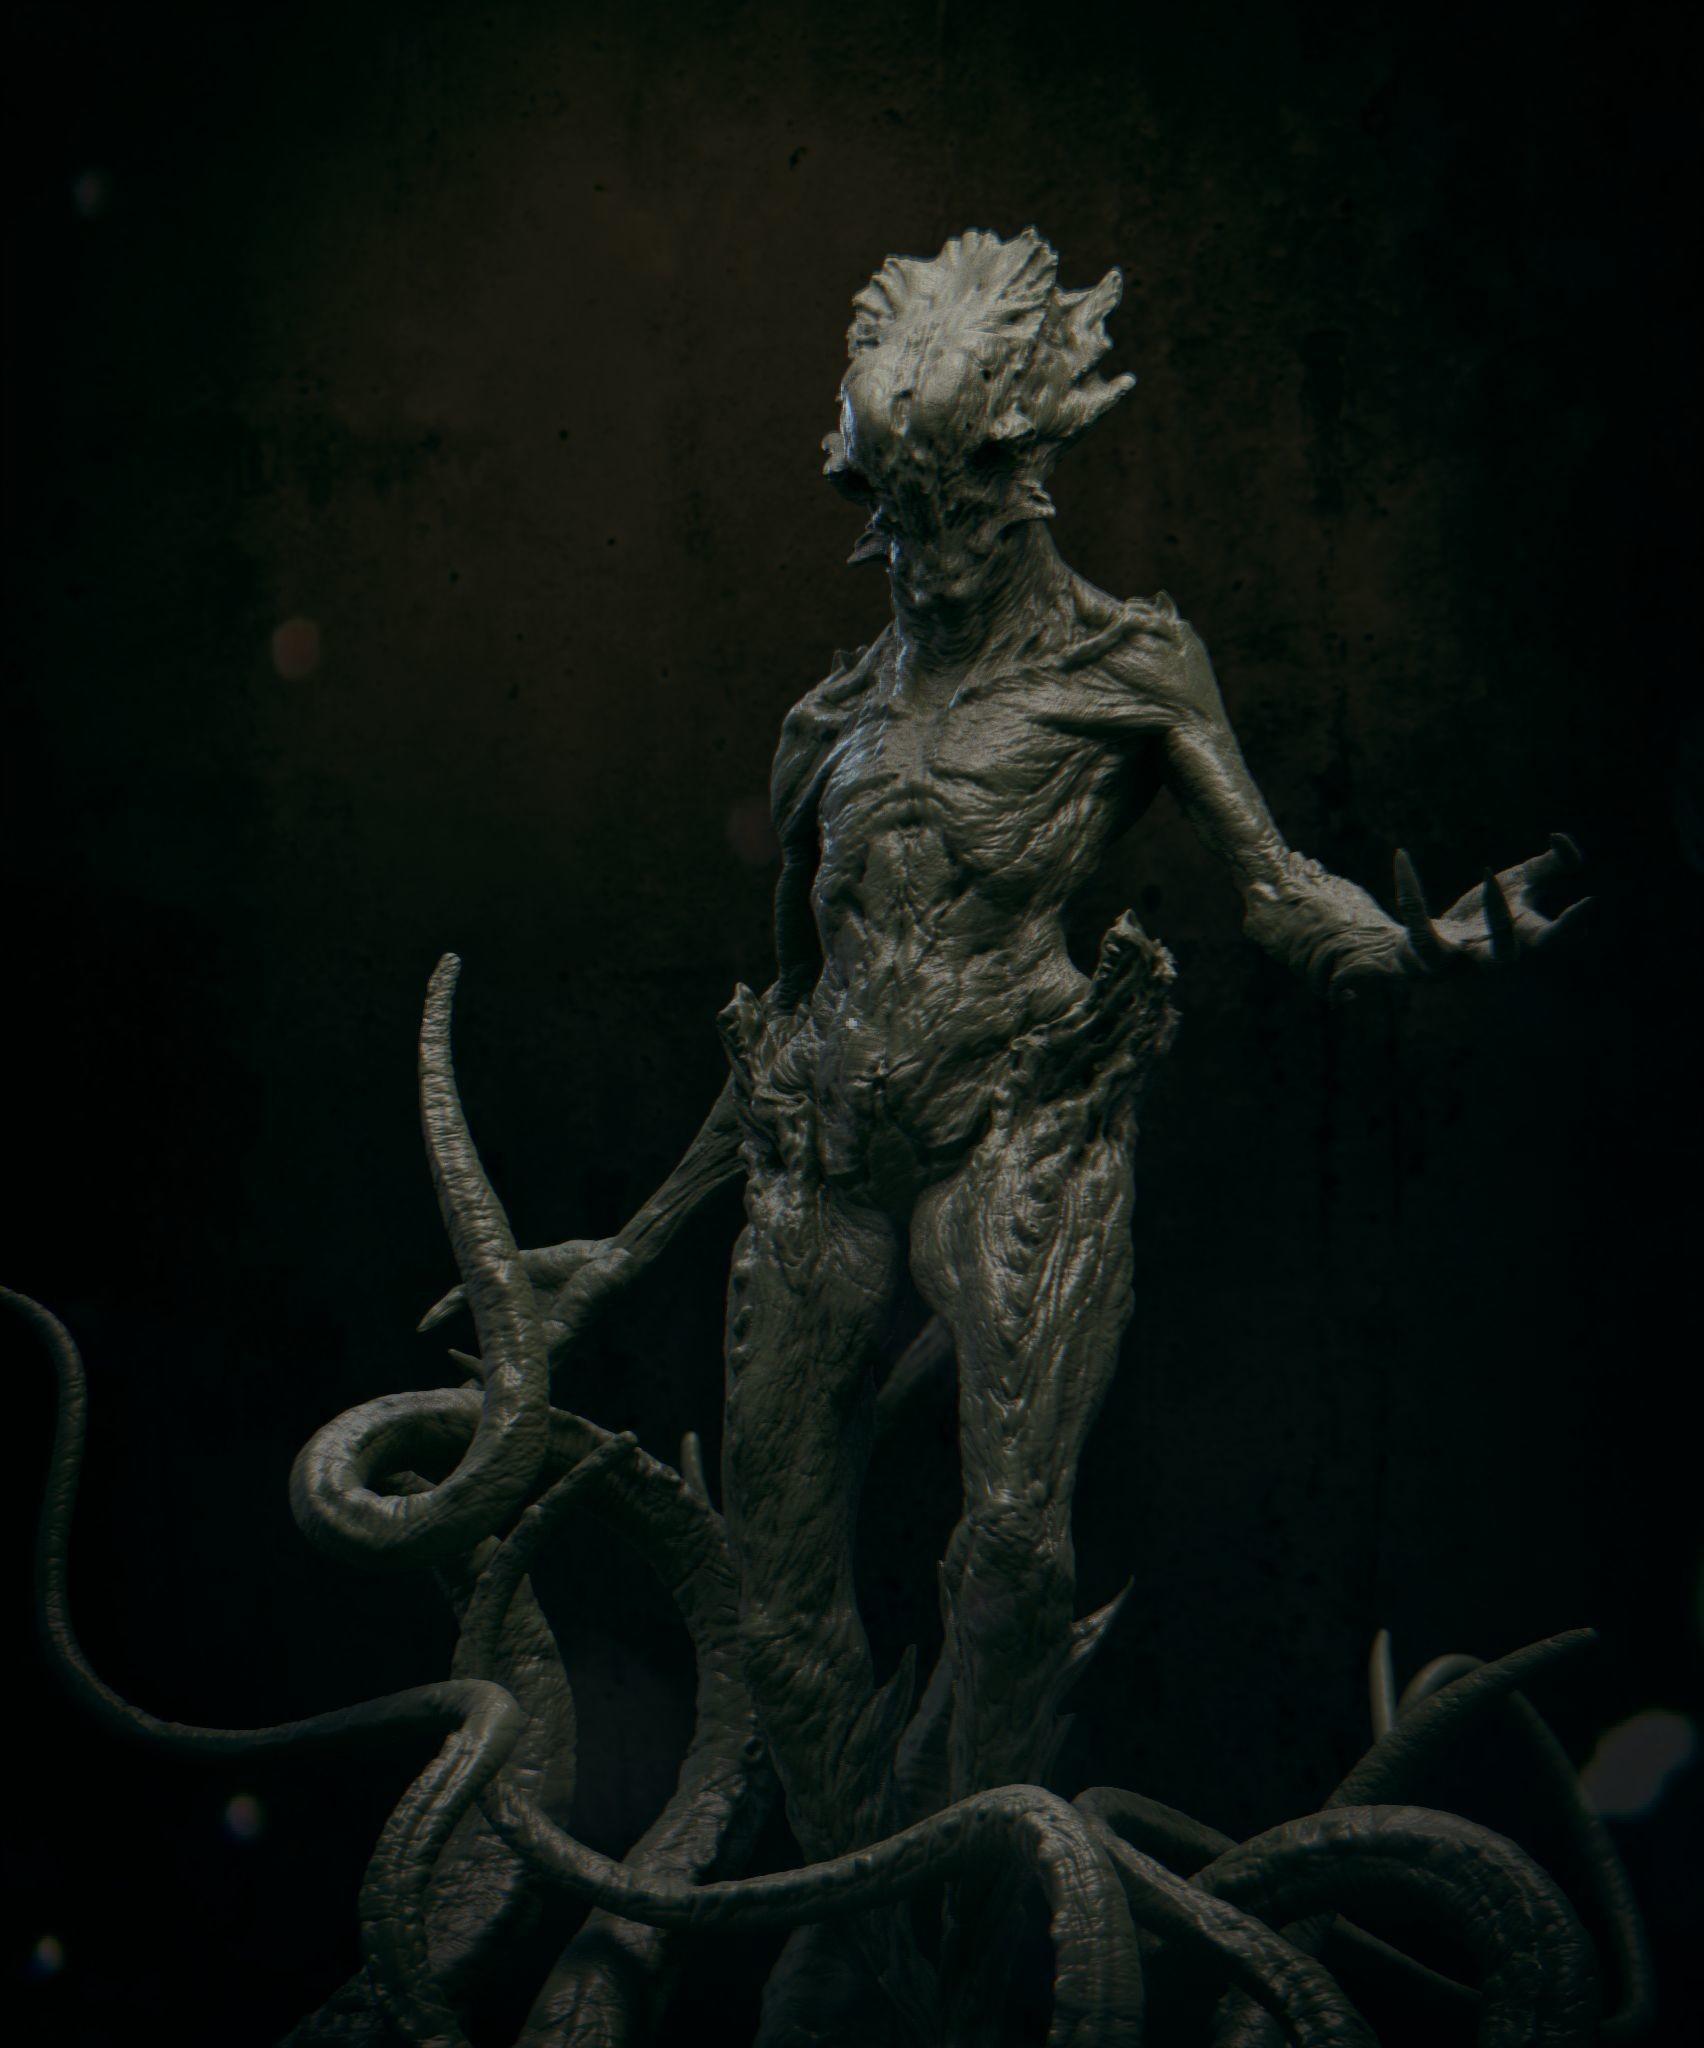 Daniel bystedt lovecraft monster 05